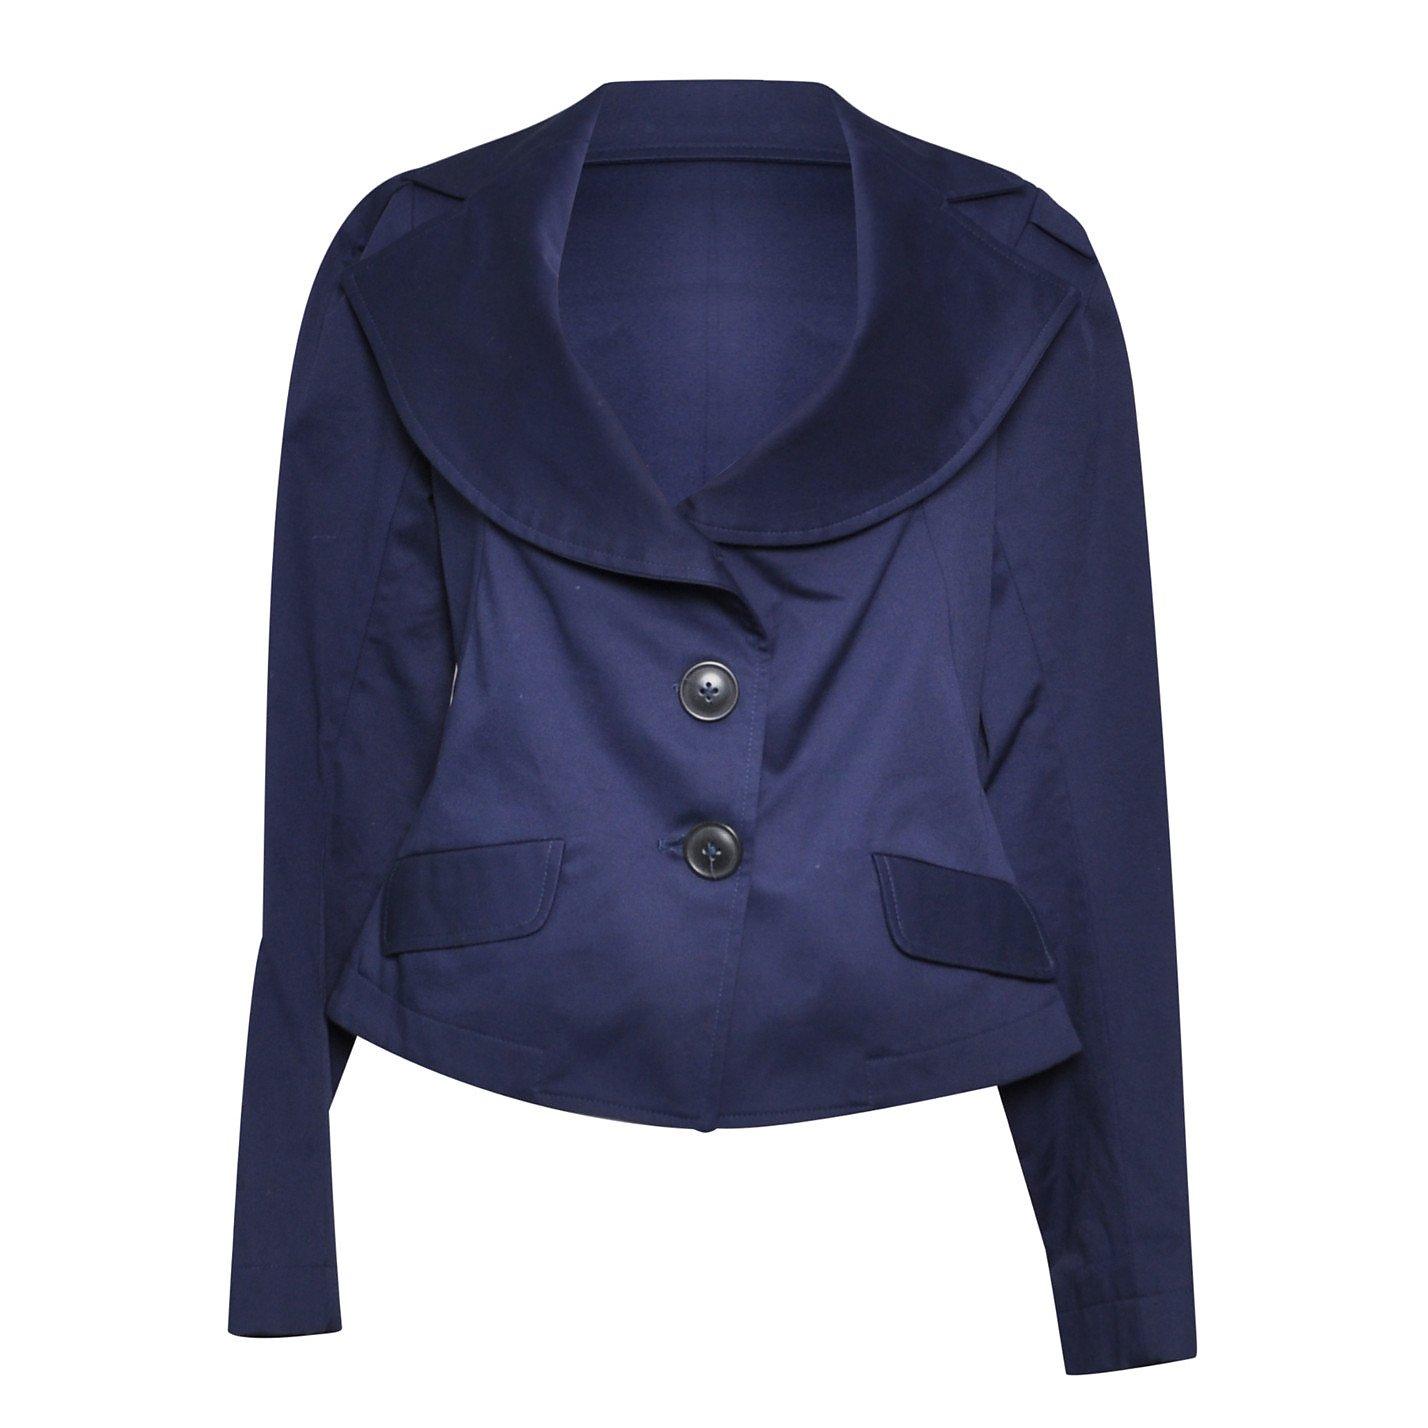 Vivienne Westwood Anglomania Cropped Blazer